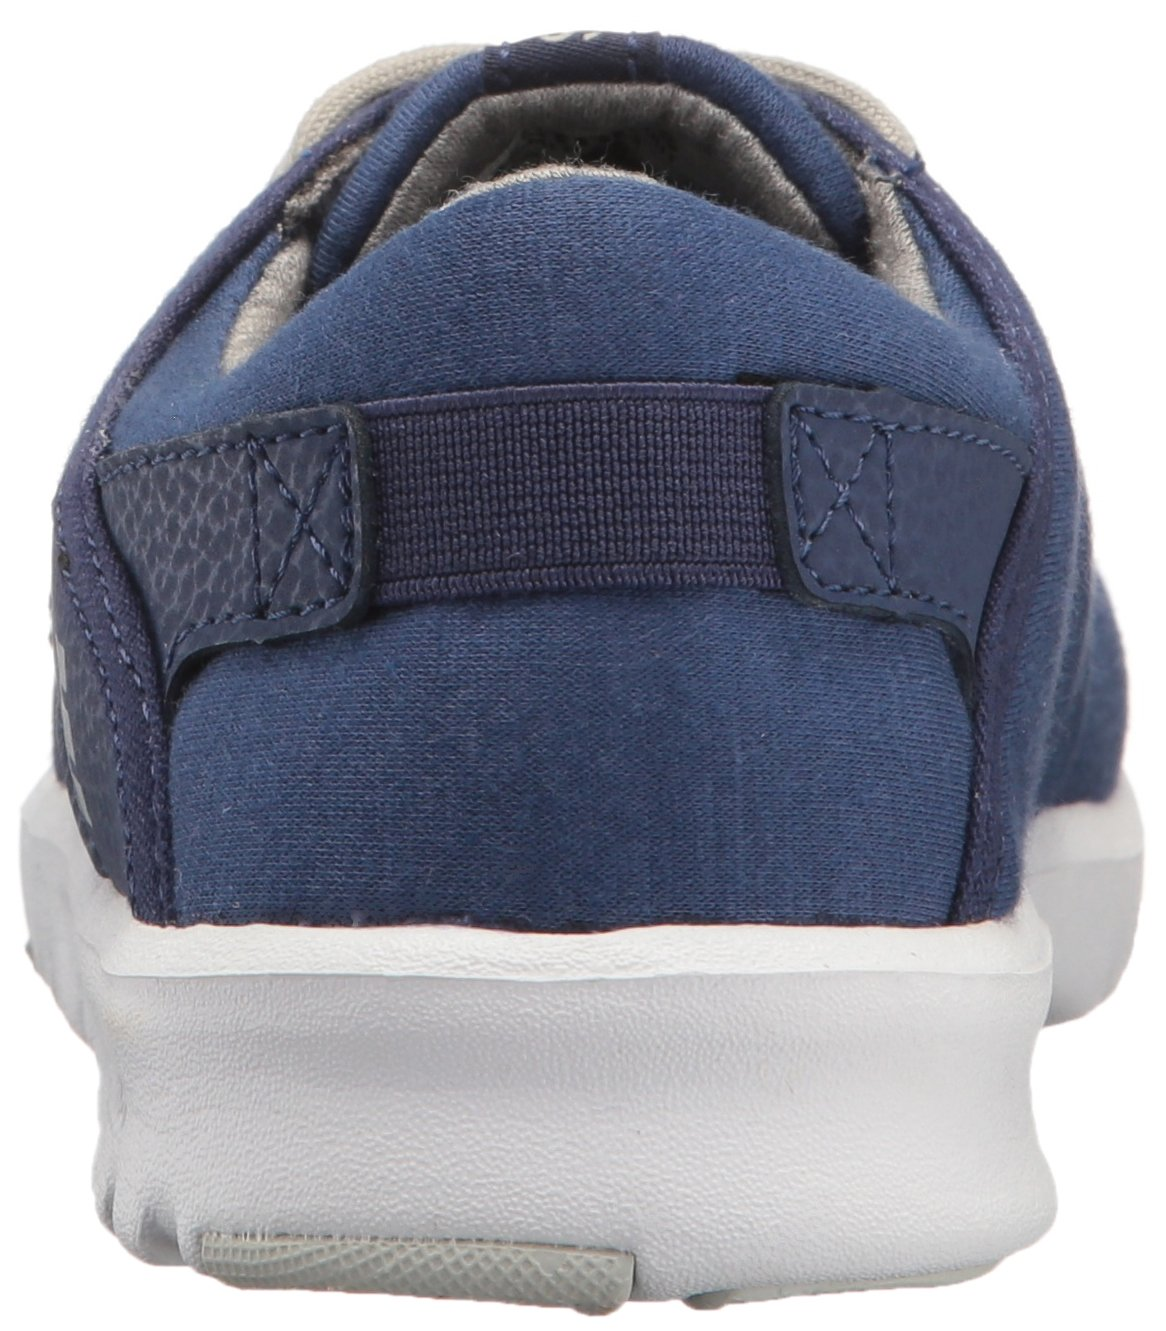 Etnies 5 Womens Scout Sneaker B01N292W00 5 Etnies B(M) US|Navy/Grey/White d384a4